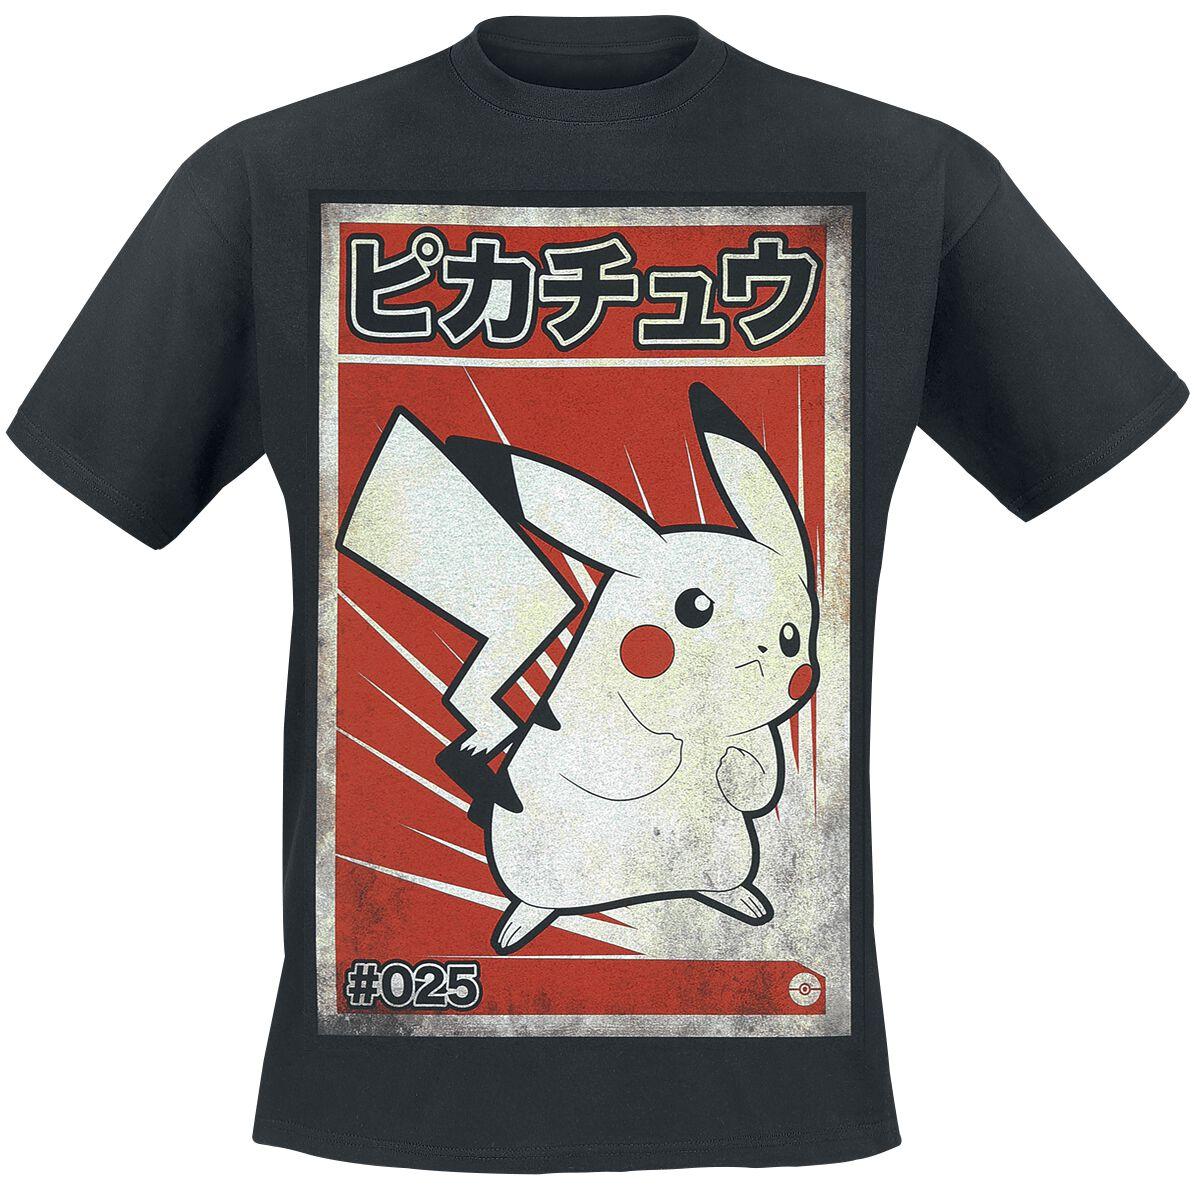 323a7d9c Pikachu - Propaganda. T-Shirt. 1 Reviews. Pokemon